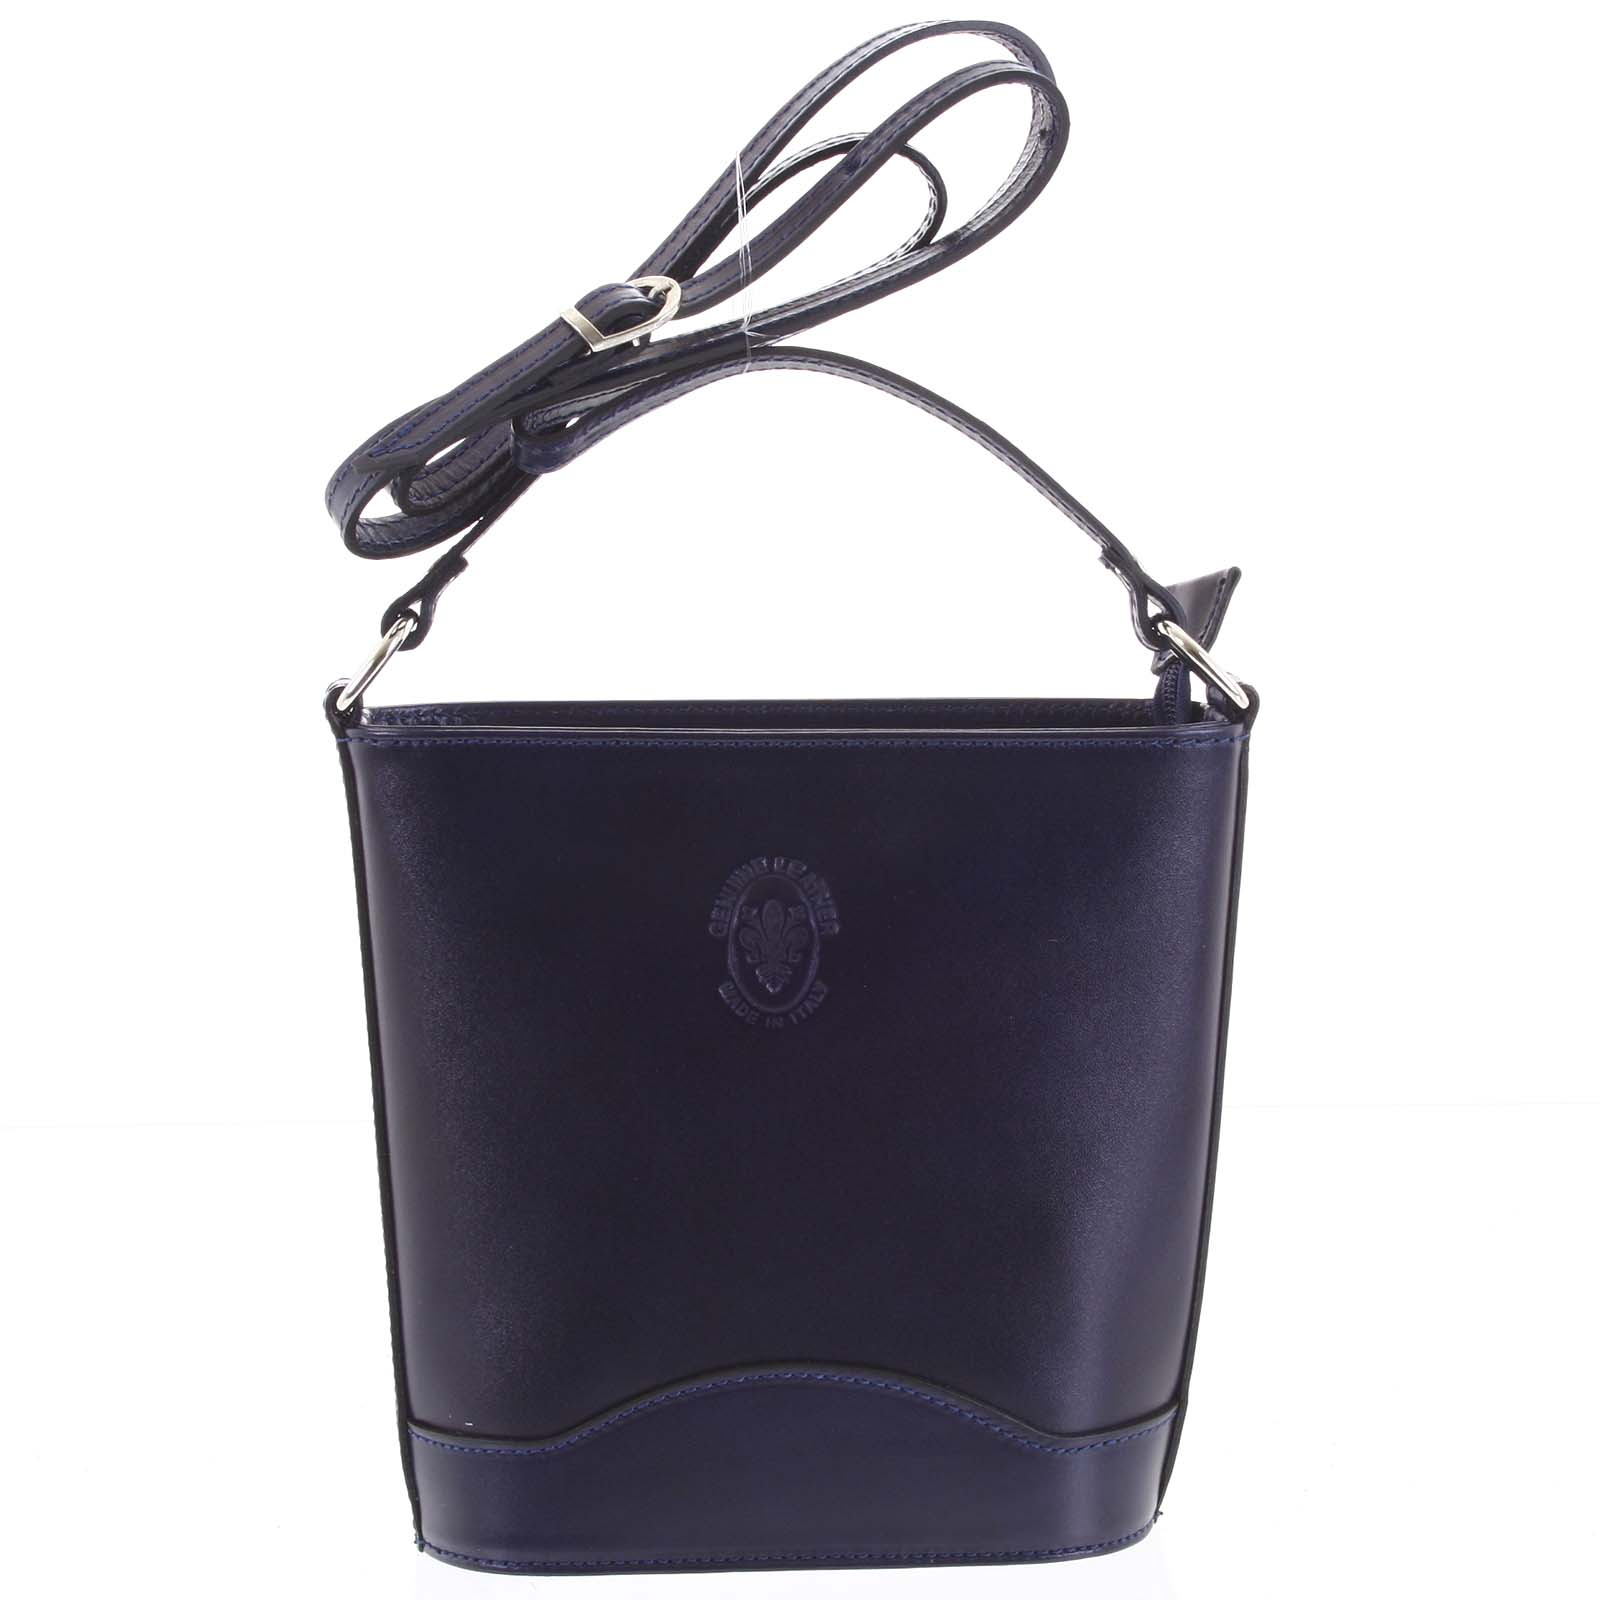 Tmavo modrá kožená crossbody kabelka Italo Bryana tmavo modra